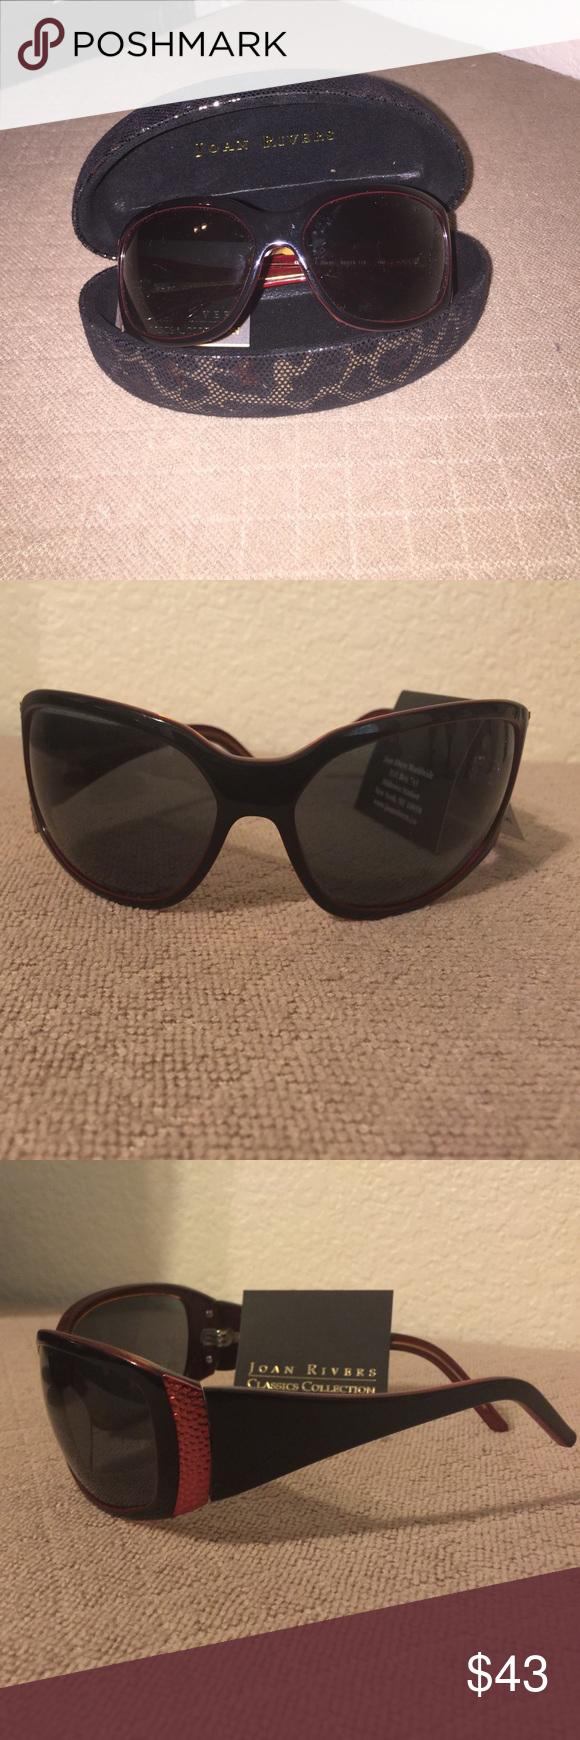 89030ed74425f Joan Rivers Classic Collection Sunglasses Joan Rivers Classic Collection  Sunglasses - Gorgeous and elegant sunglasses Joan Rivers Accessories  Sunglasses